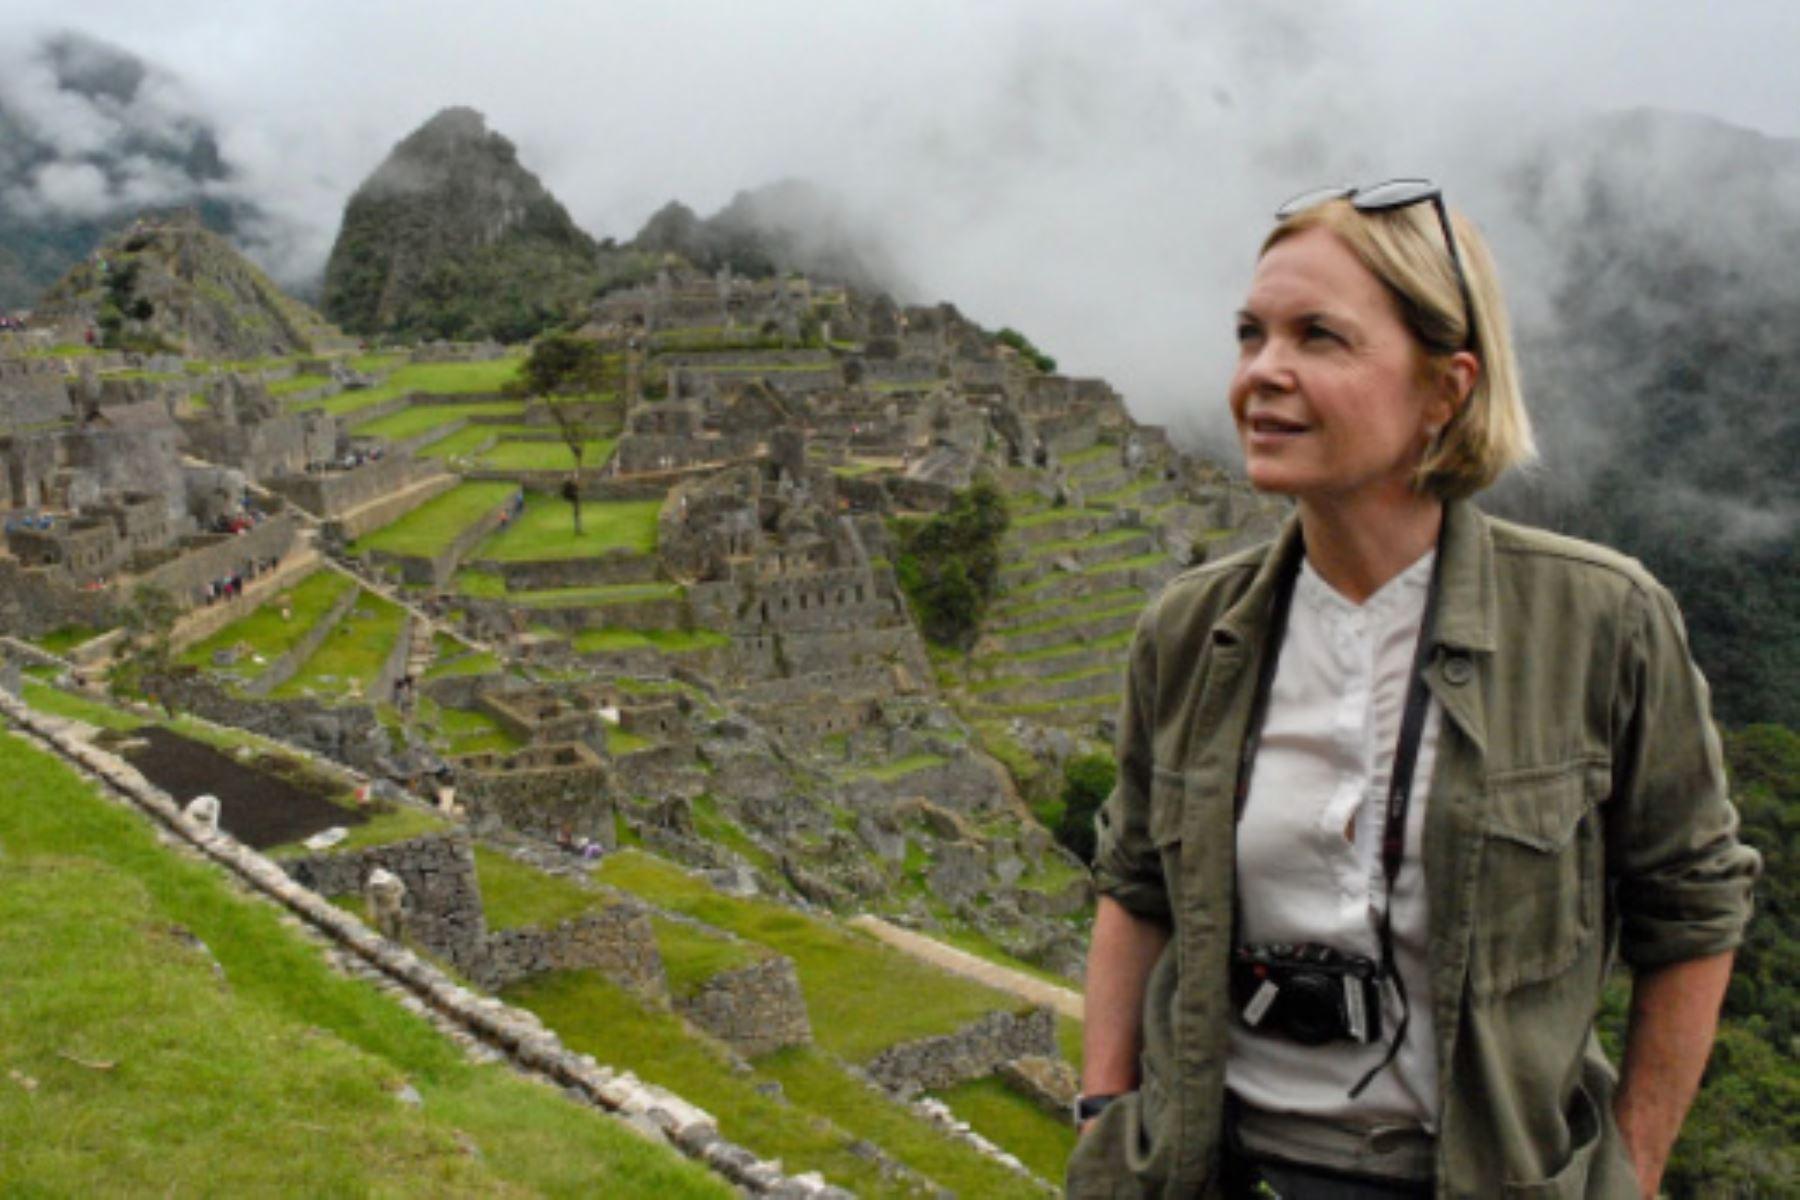 La periodista noruega-escocesa Mariella Frostrup, del diario inglés The Telegraph,asegura que cada día en Perú la transportaba a otras alturas. Foto: Mariella Frostrup